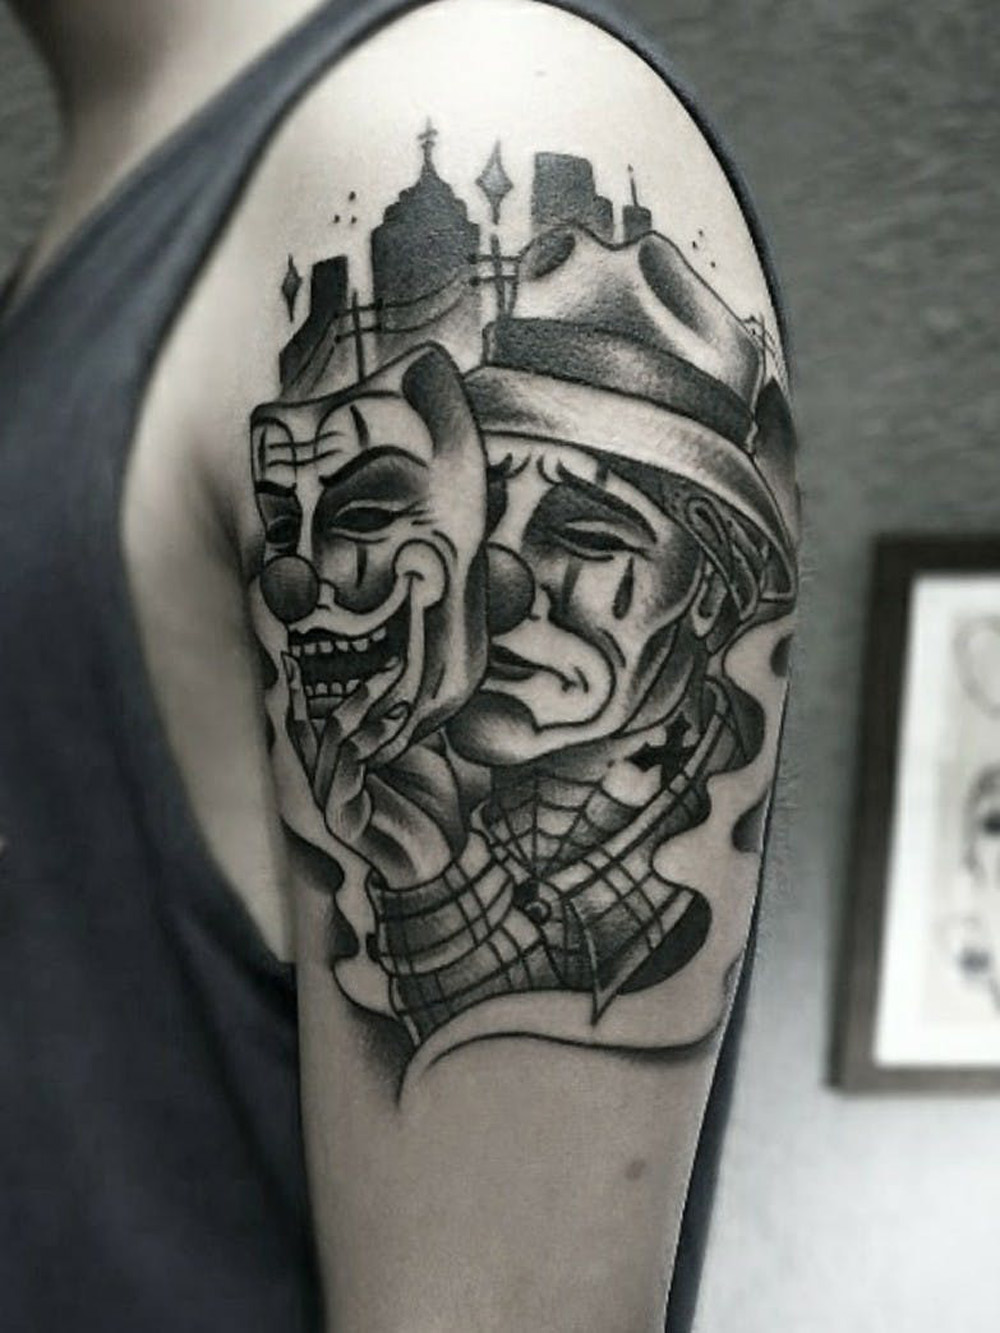 Tatuagem chora agora, ri depois